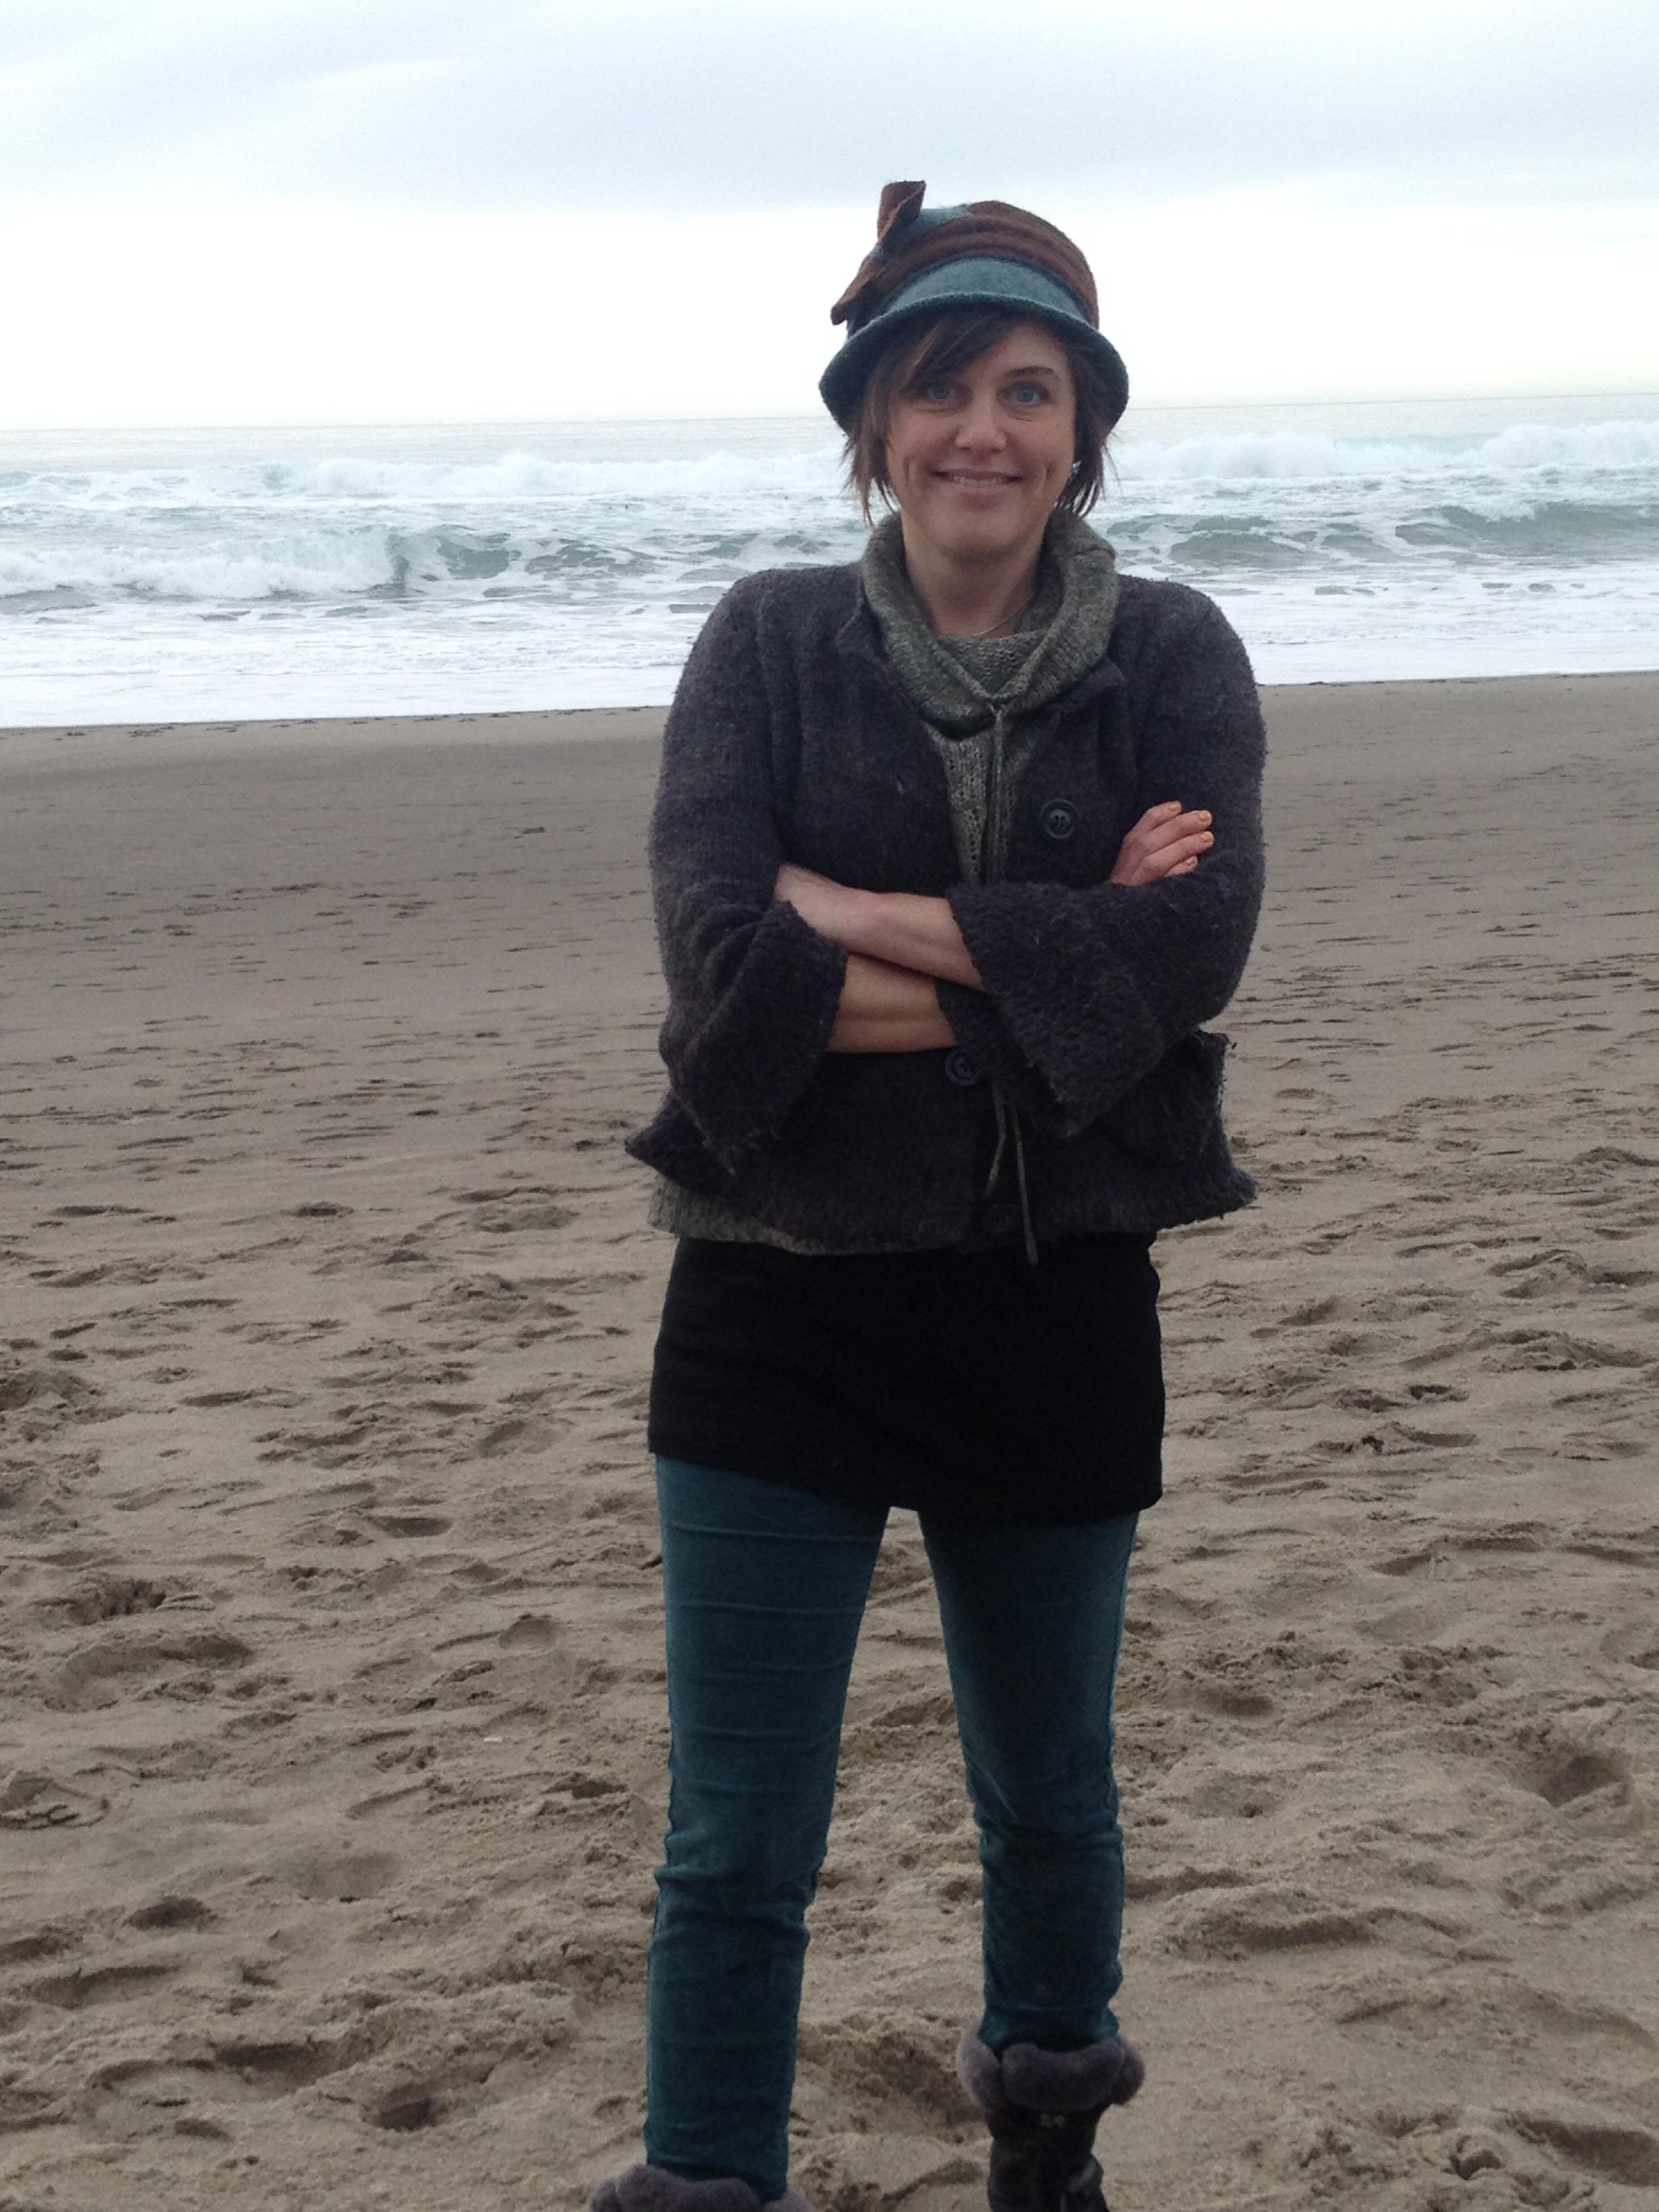 Facilitator Kaia Sand retreats often to the Oregon Coast for her writing